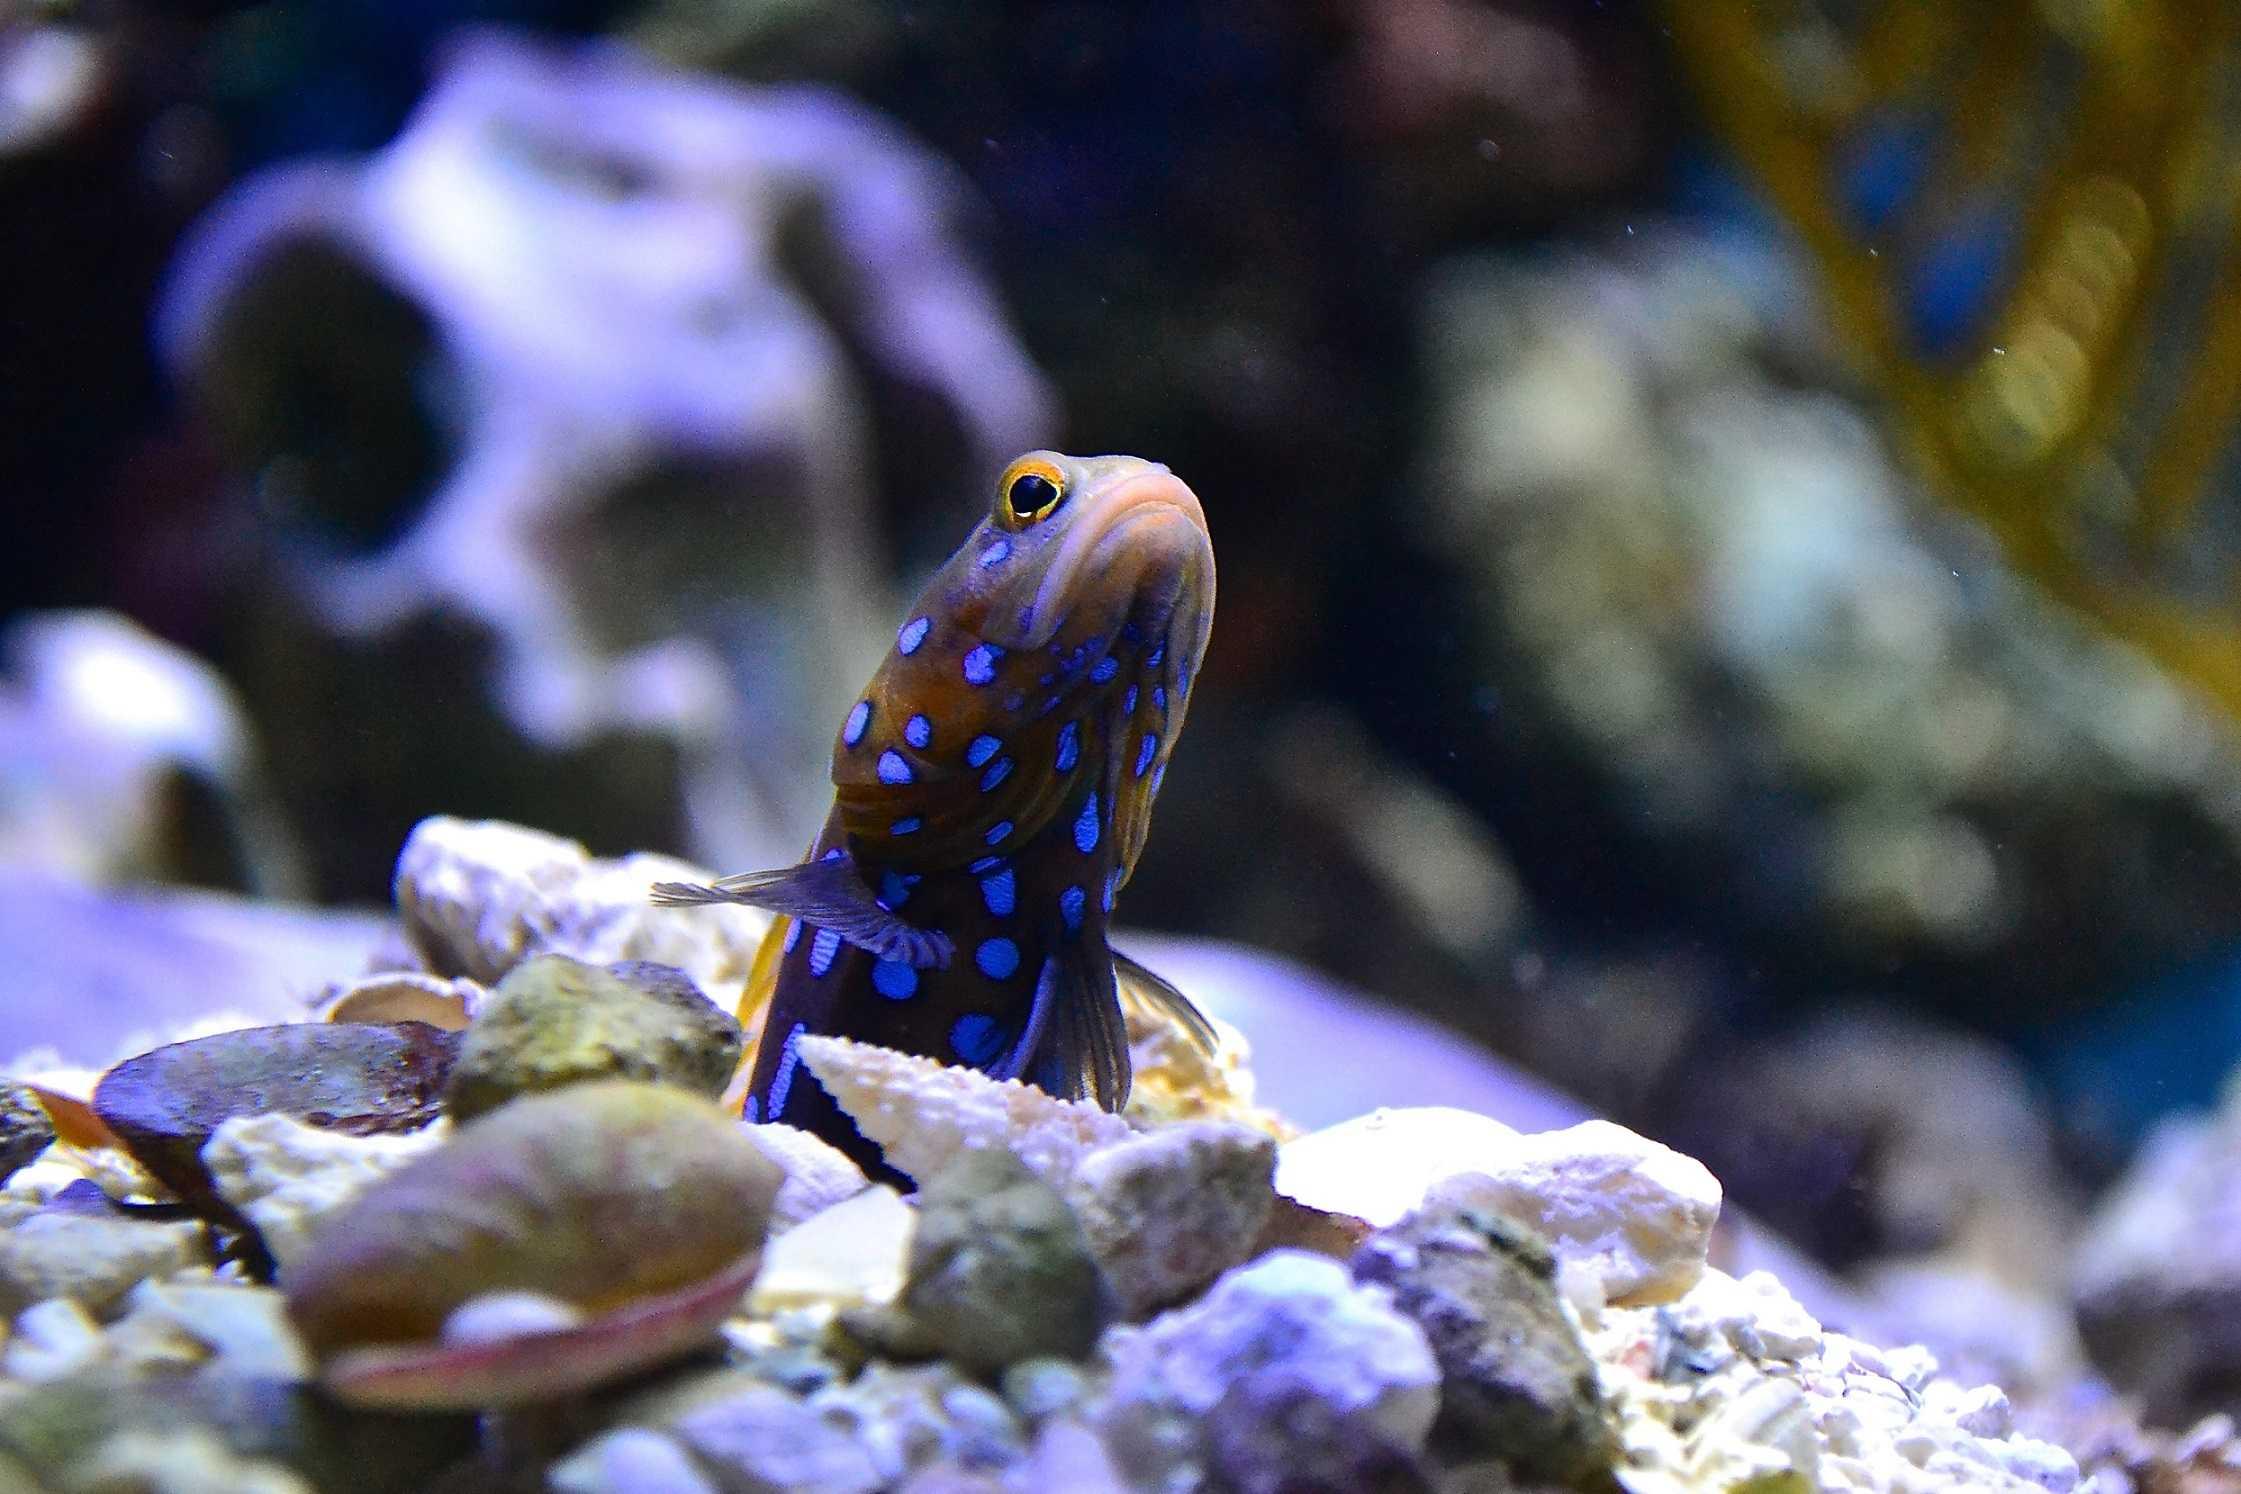 Lil Fish Guy